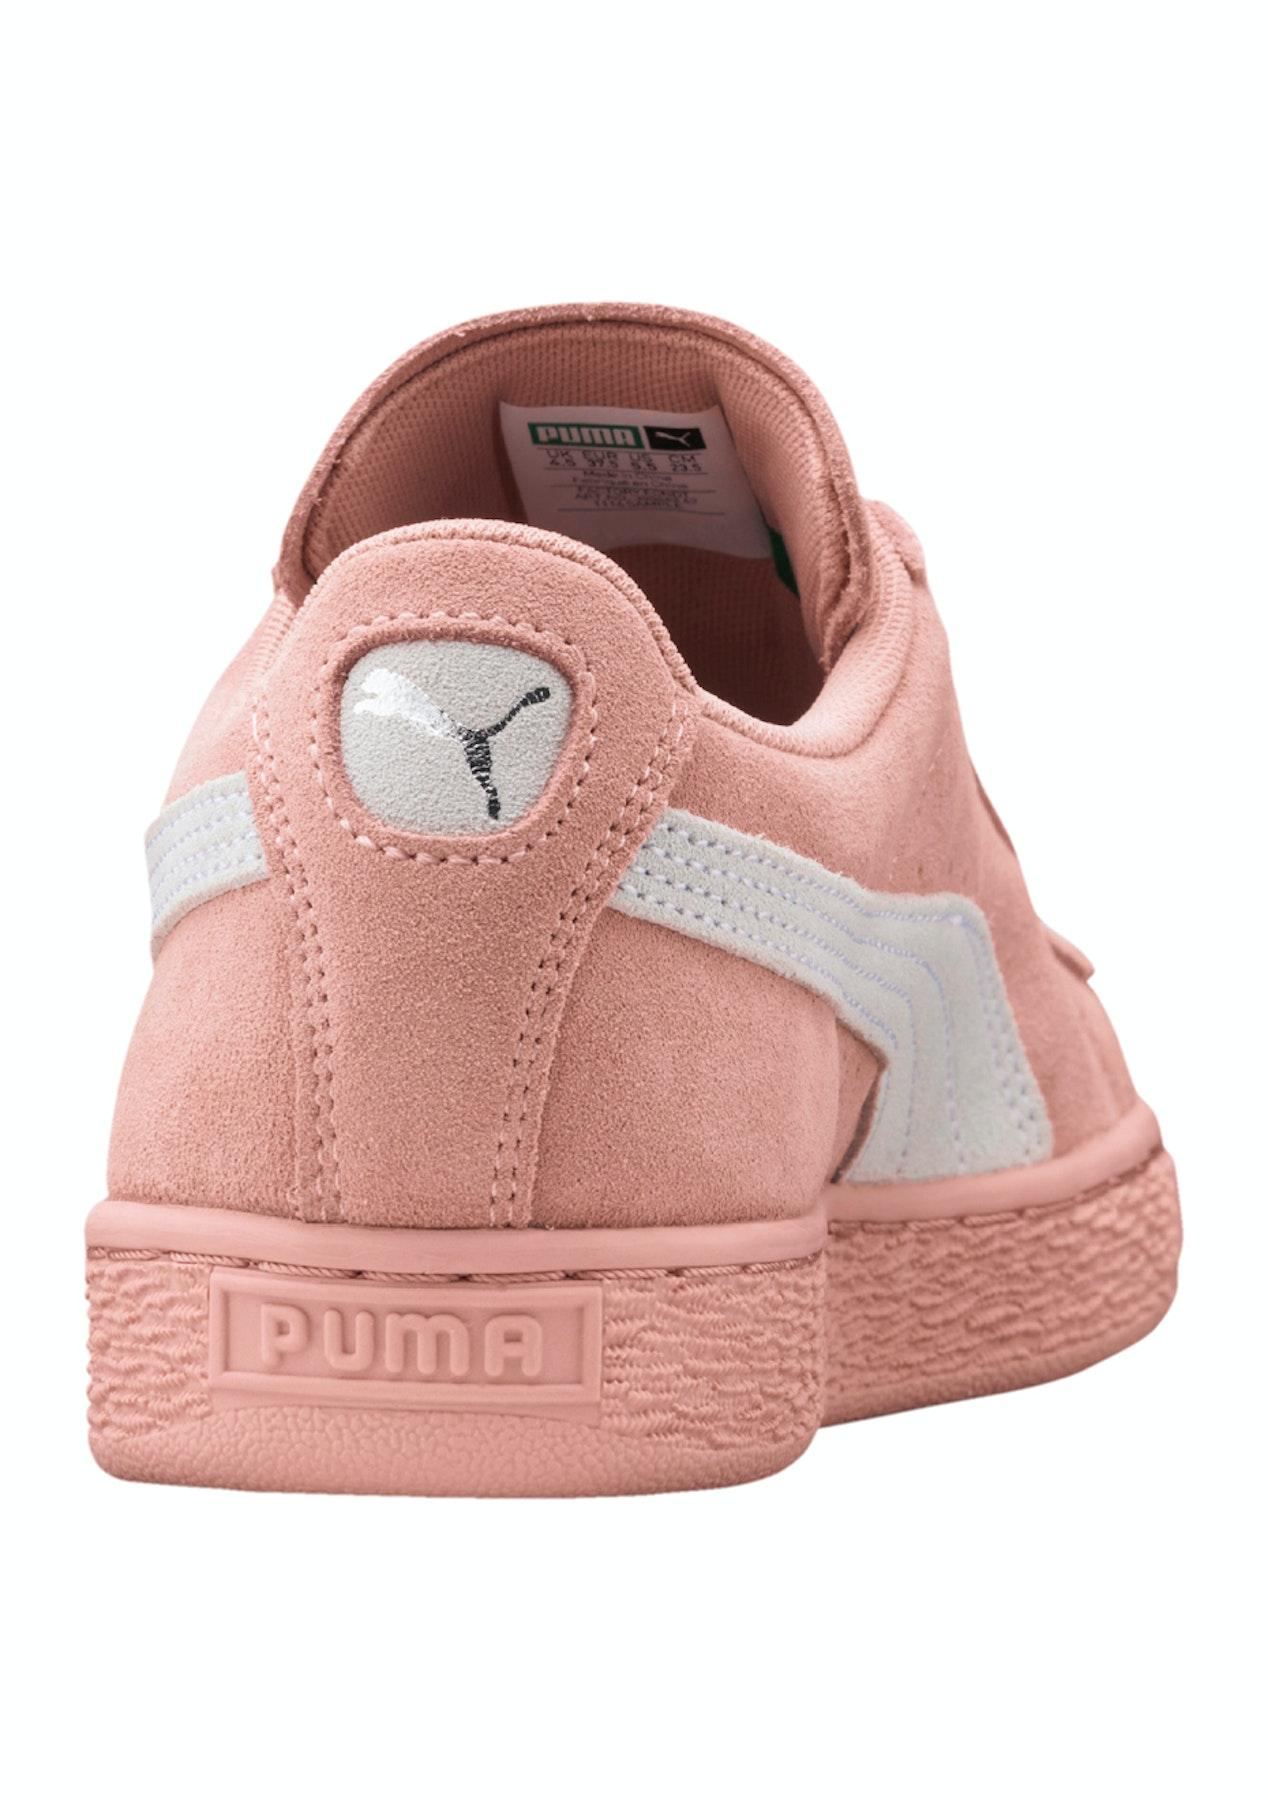 b547e30a9588 Puma Womens - Suede Classic - Peach - Under  70 Puma   Reebok Mega  Clearance - Onceit